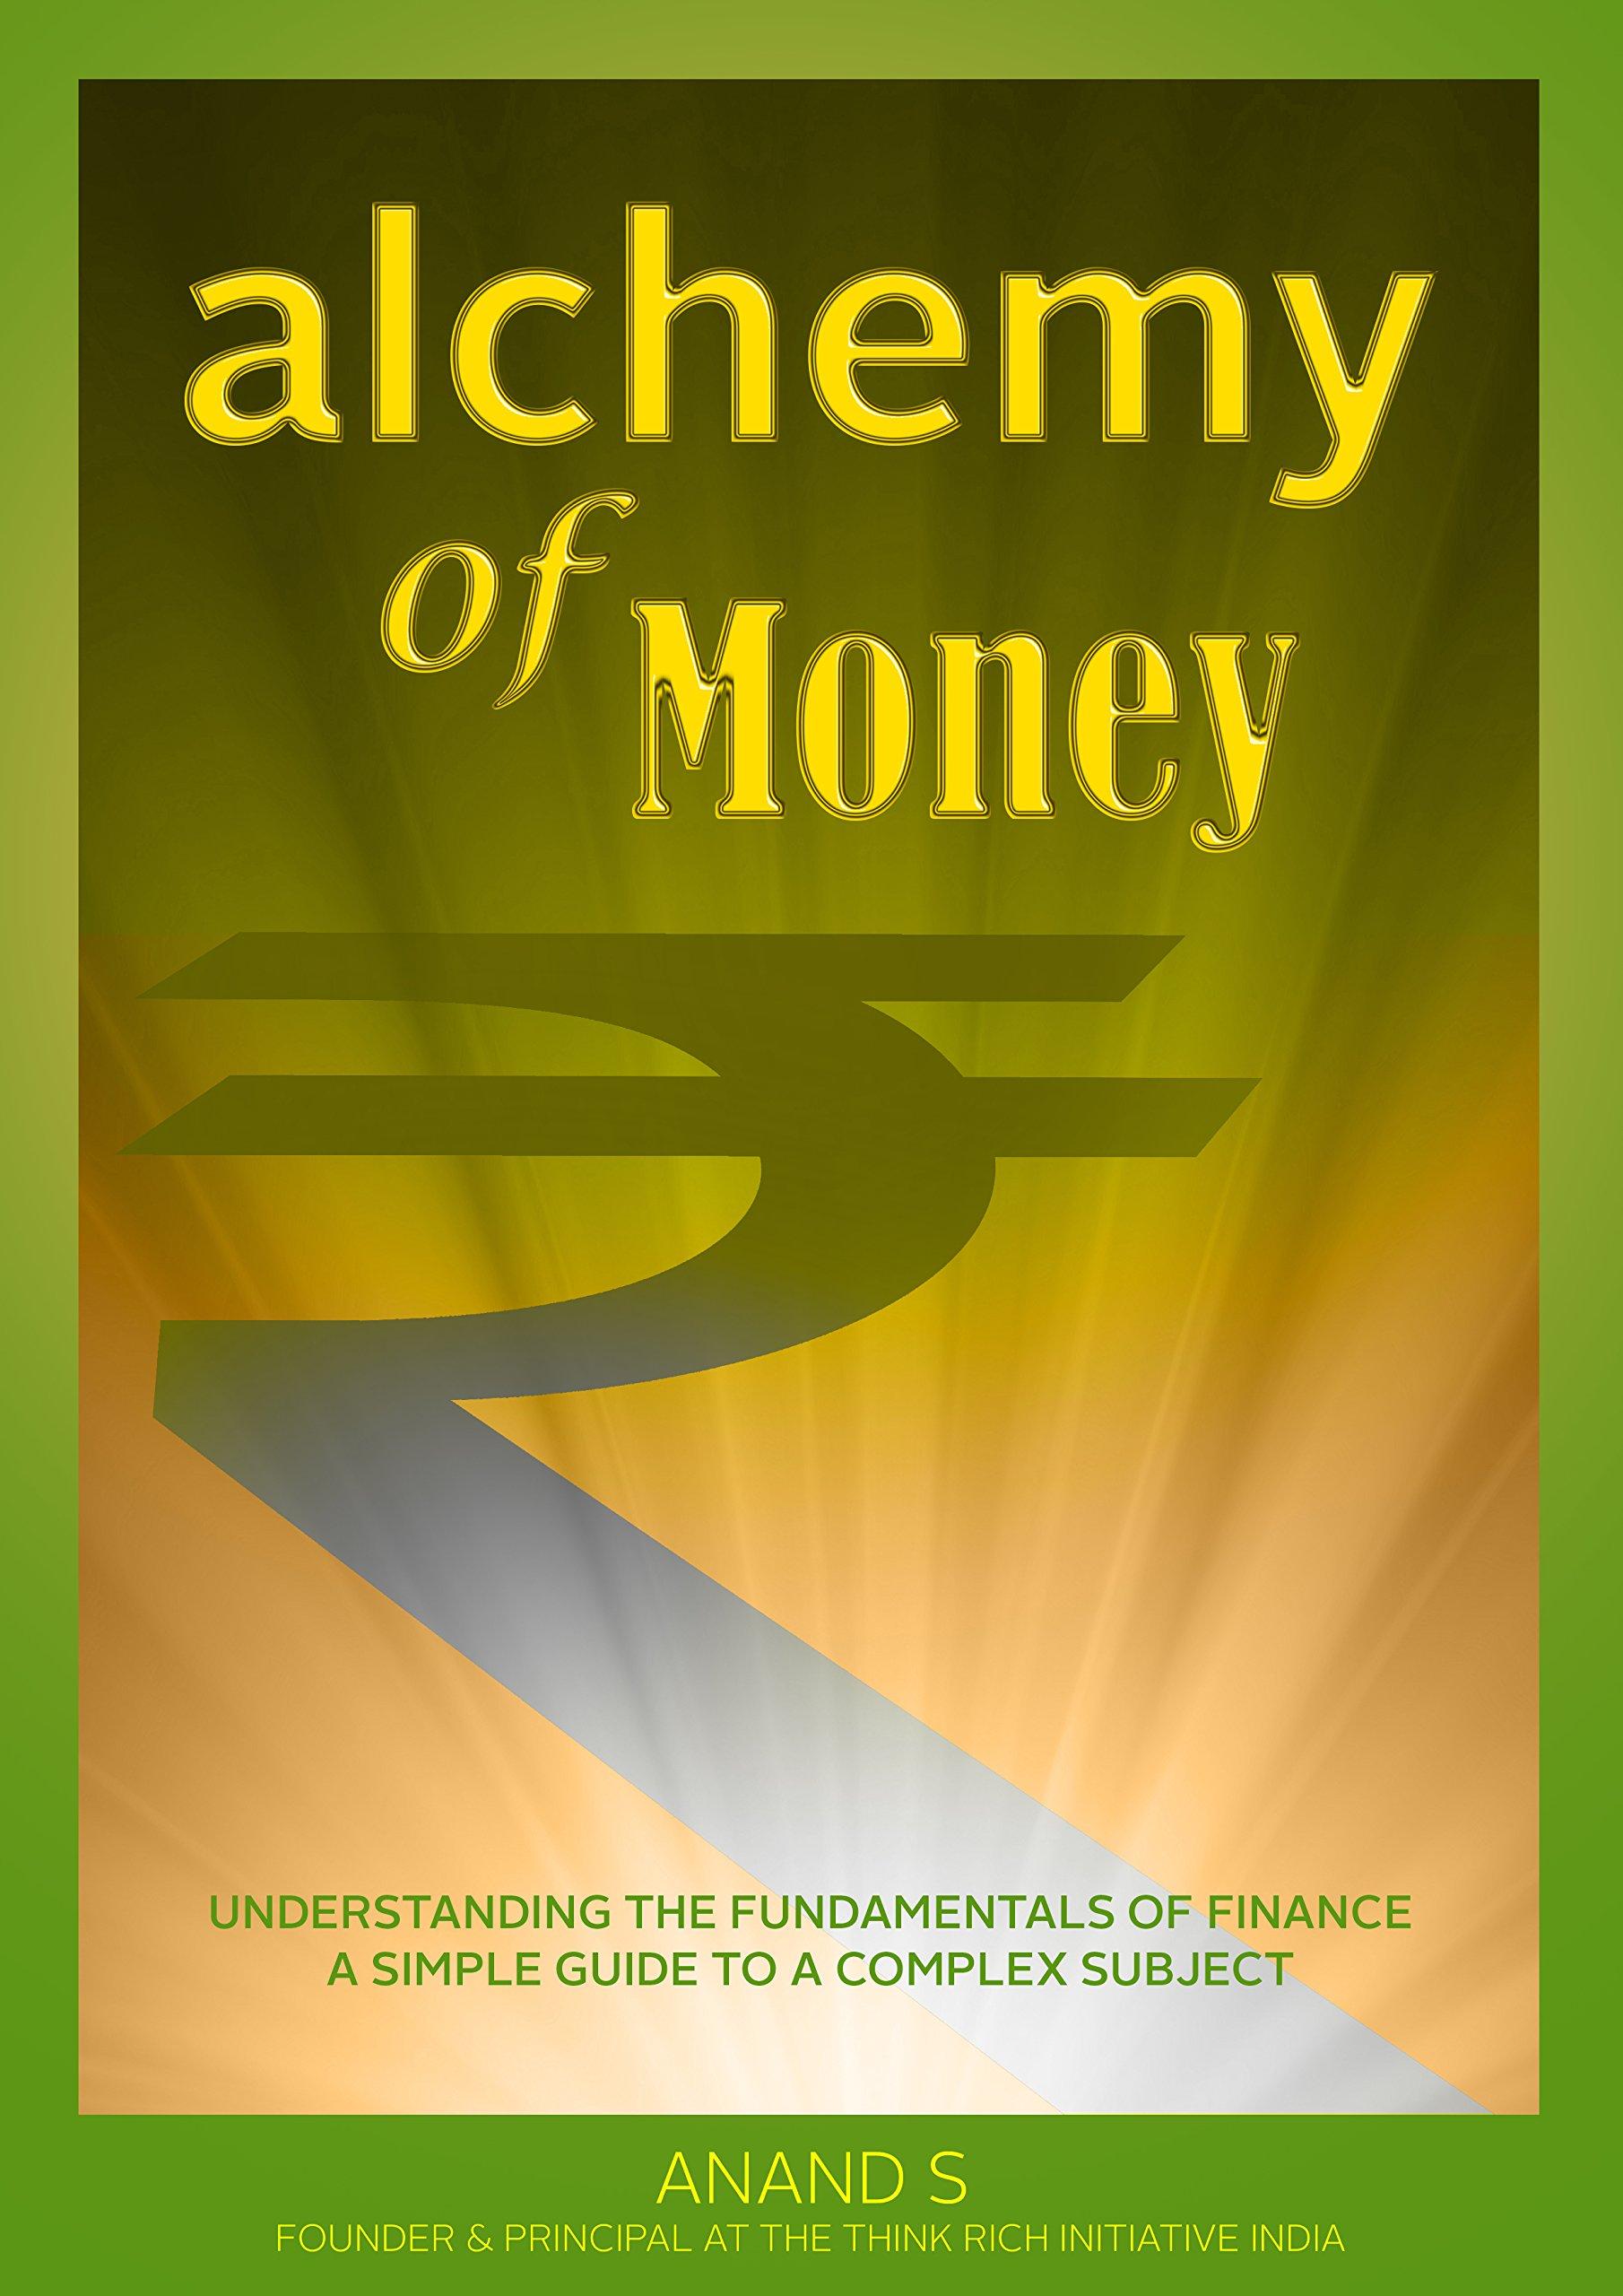 alchemy of Money: THINK RICH INITIATIVES